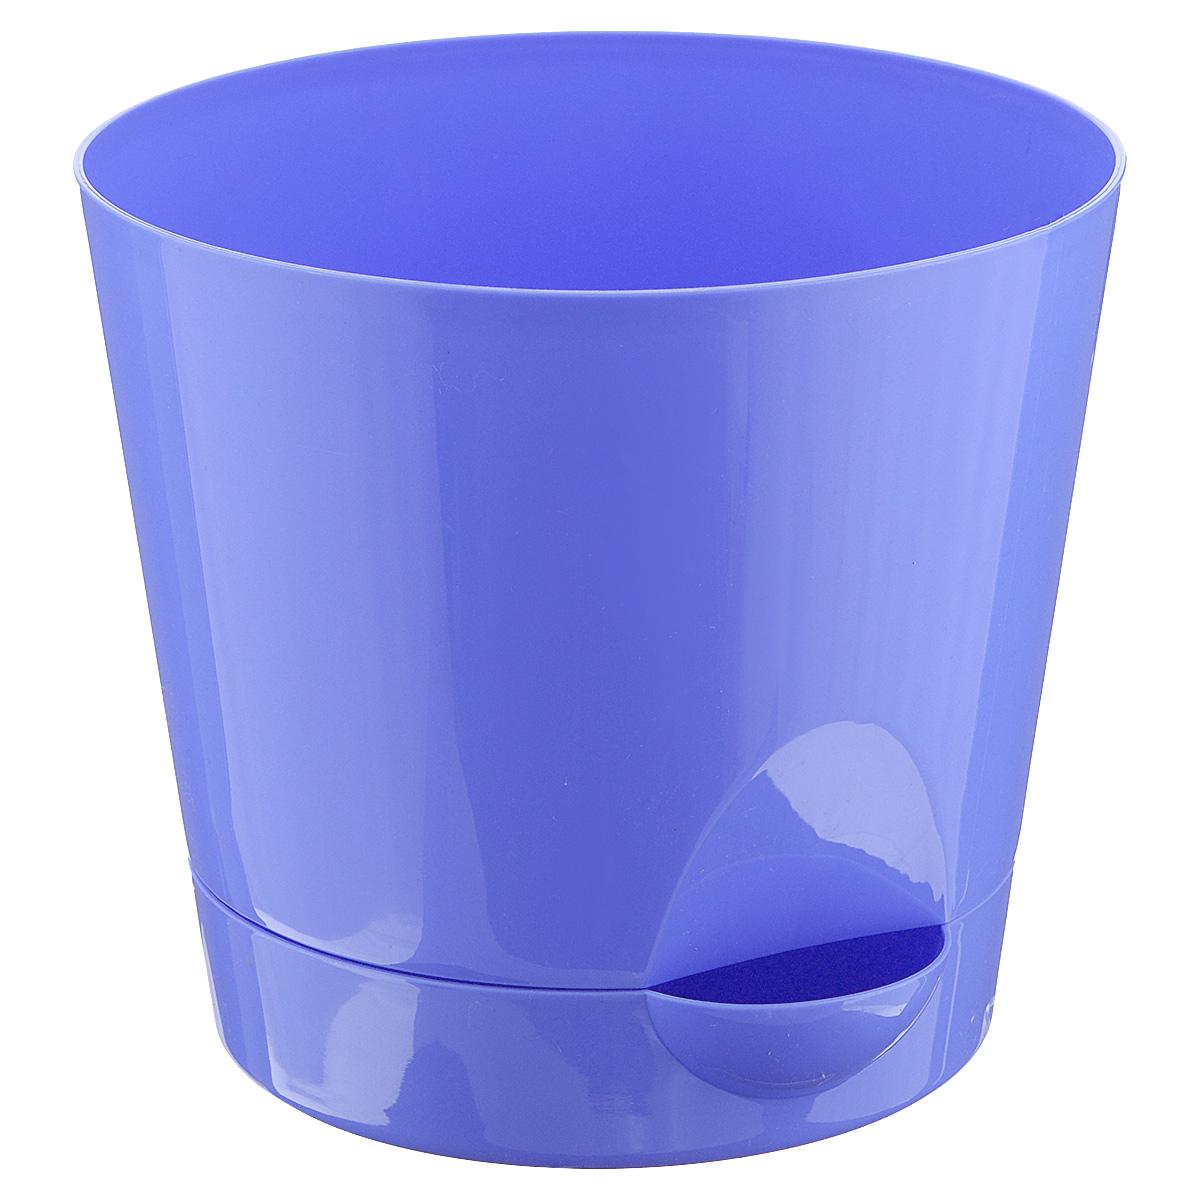 "Idea (М-пластика) Кашпо Idea ""Ника"", с прикорневым поливом, с поддоном, цвет: сиреневый, 2,7 л М 3073"